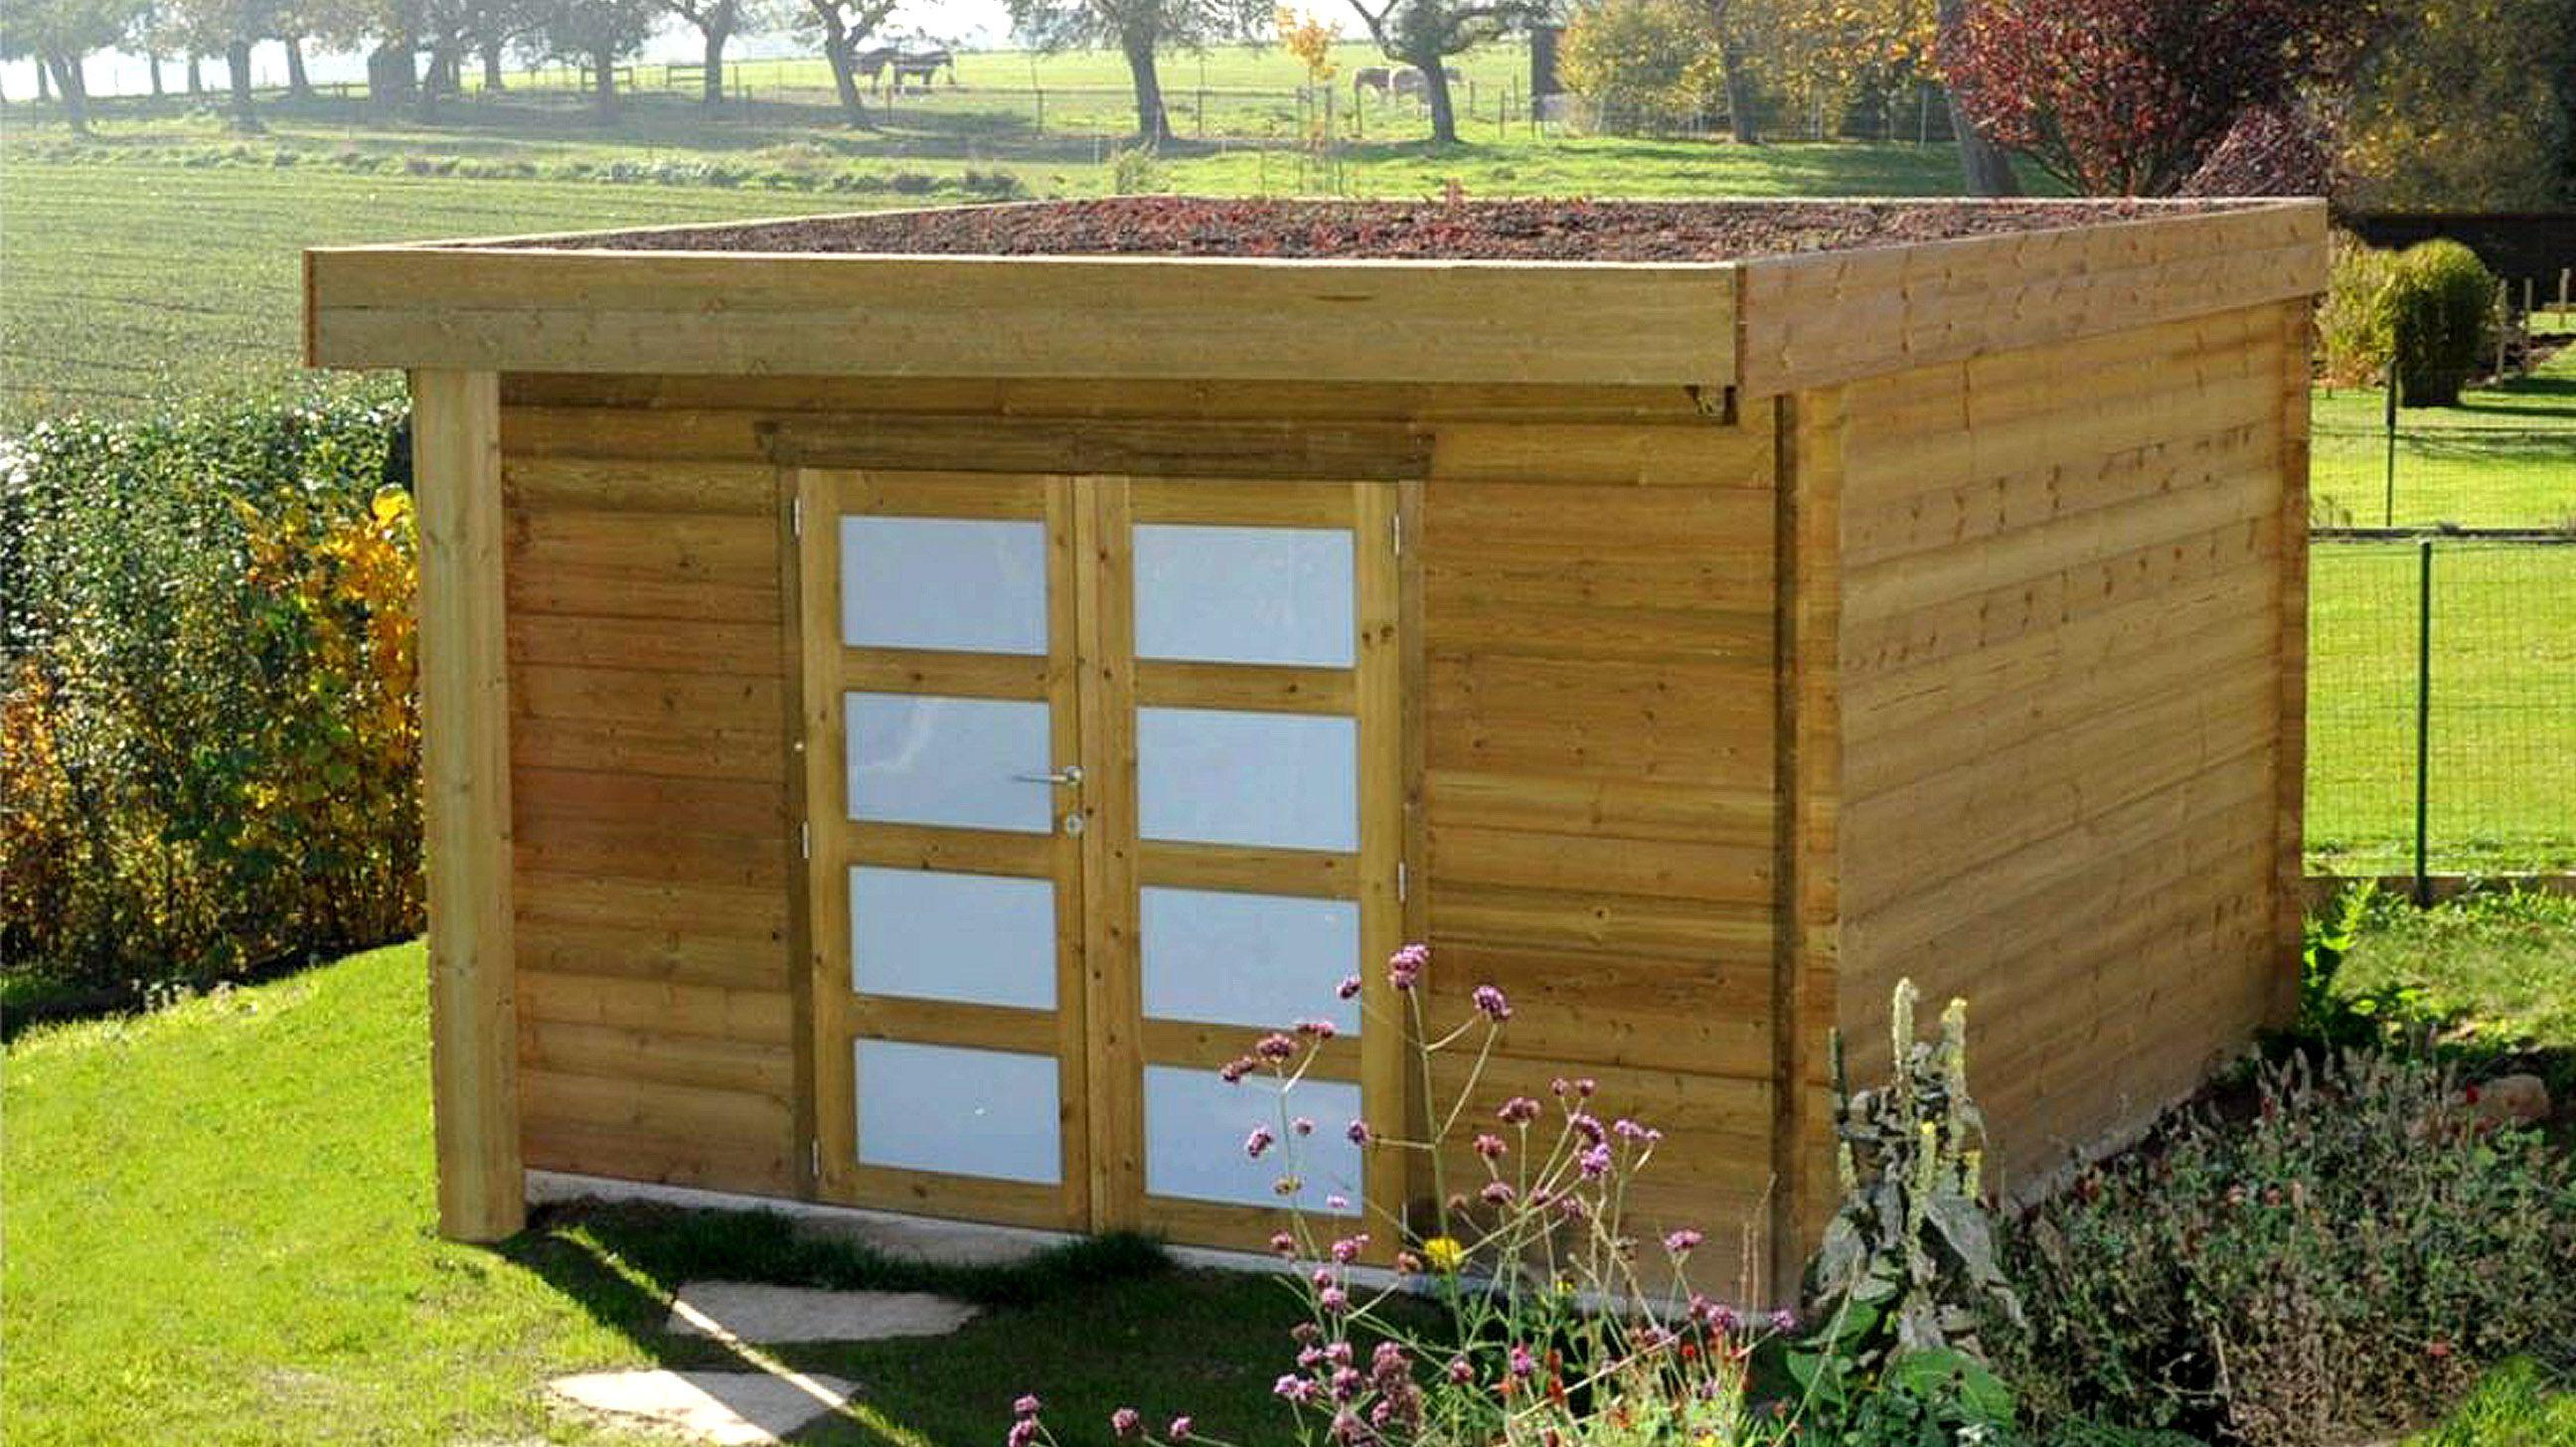 Abri De Jardin En Bois Traité - Abri De Jardin Sur Mesure ... pour Abri De Jardin Sur Mesure